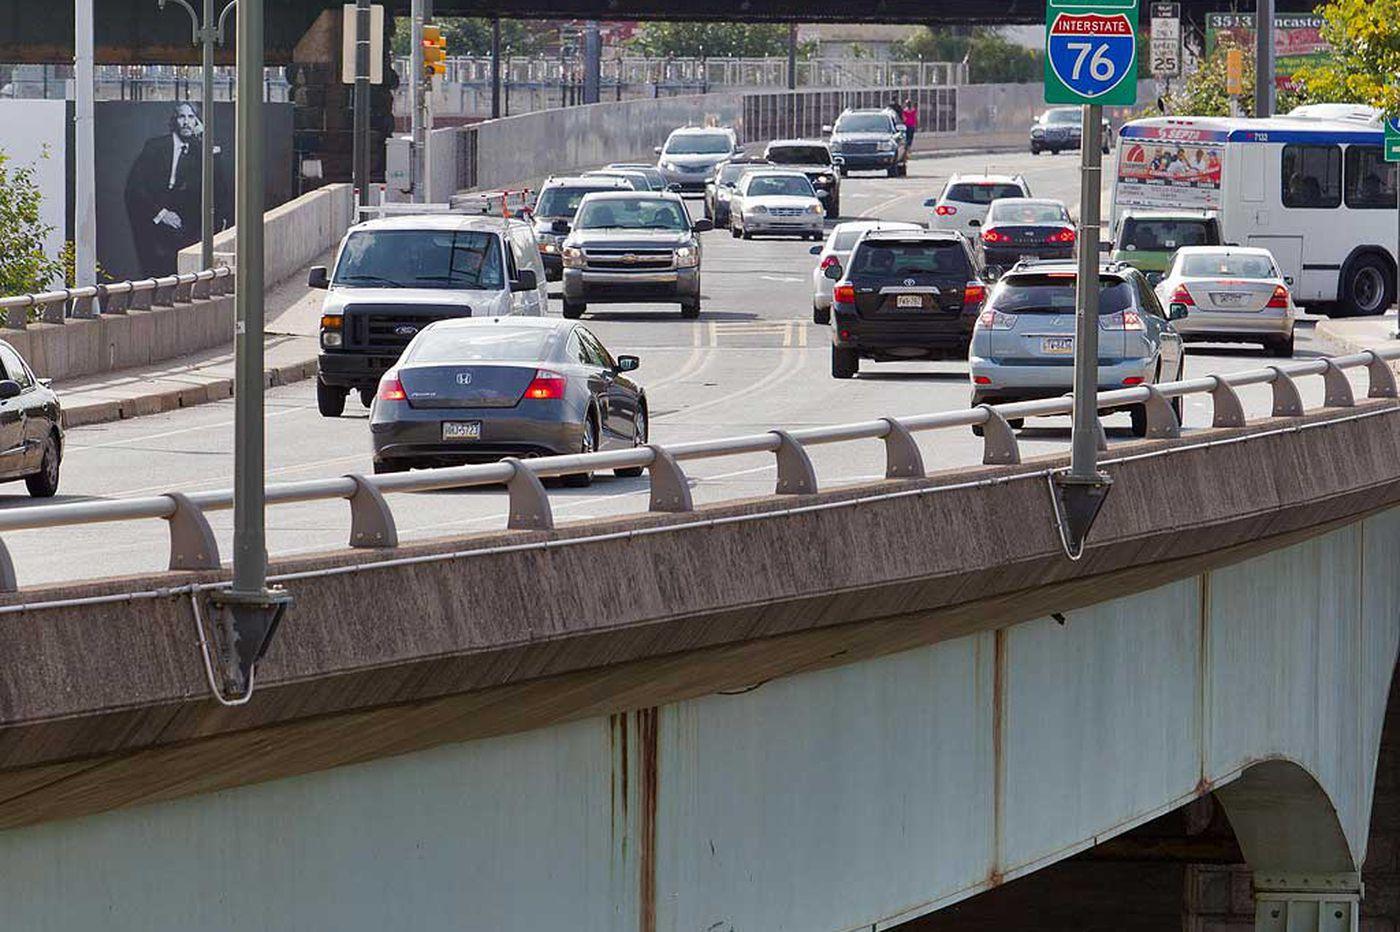 Pa. putting weight limits on 1,000 bridges